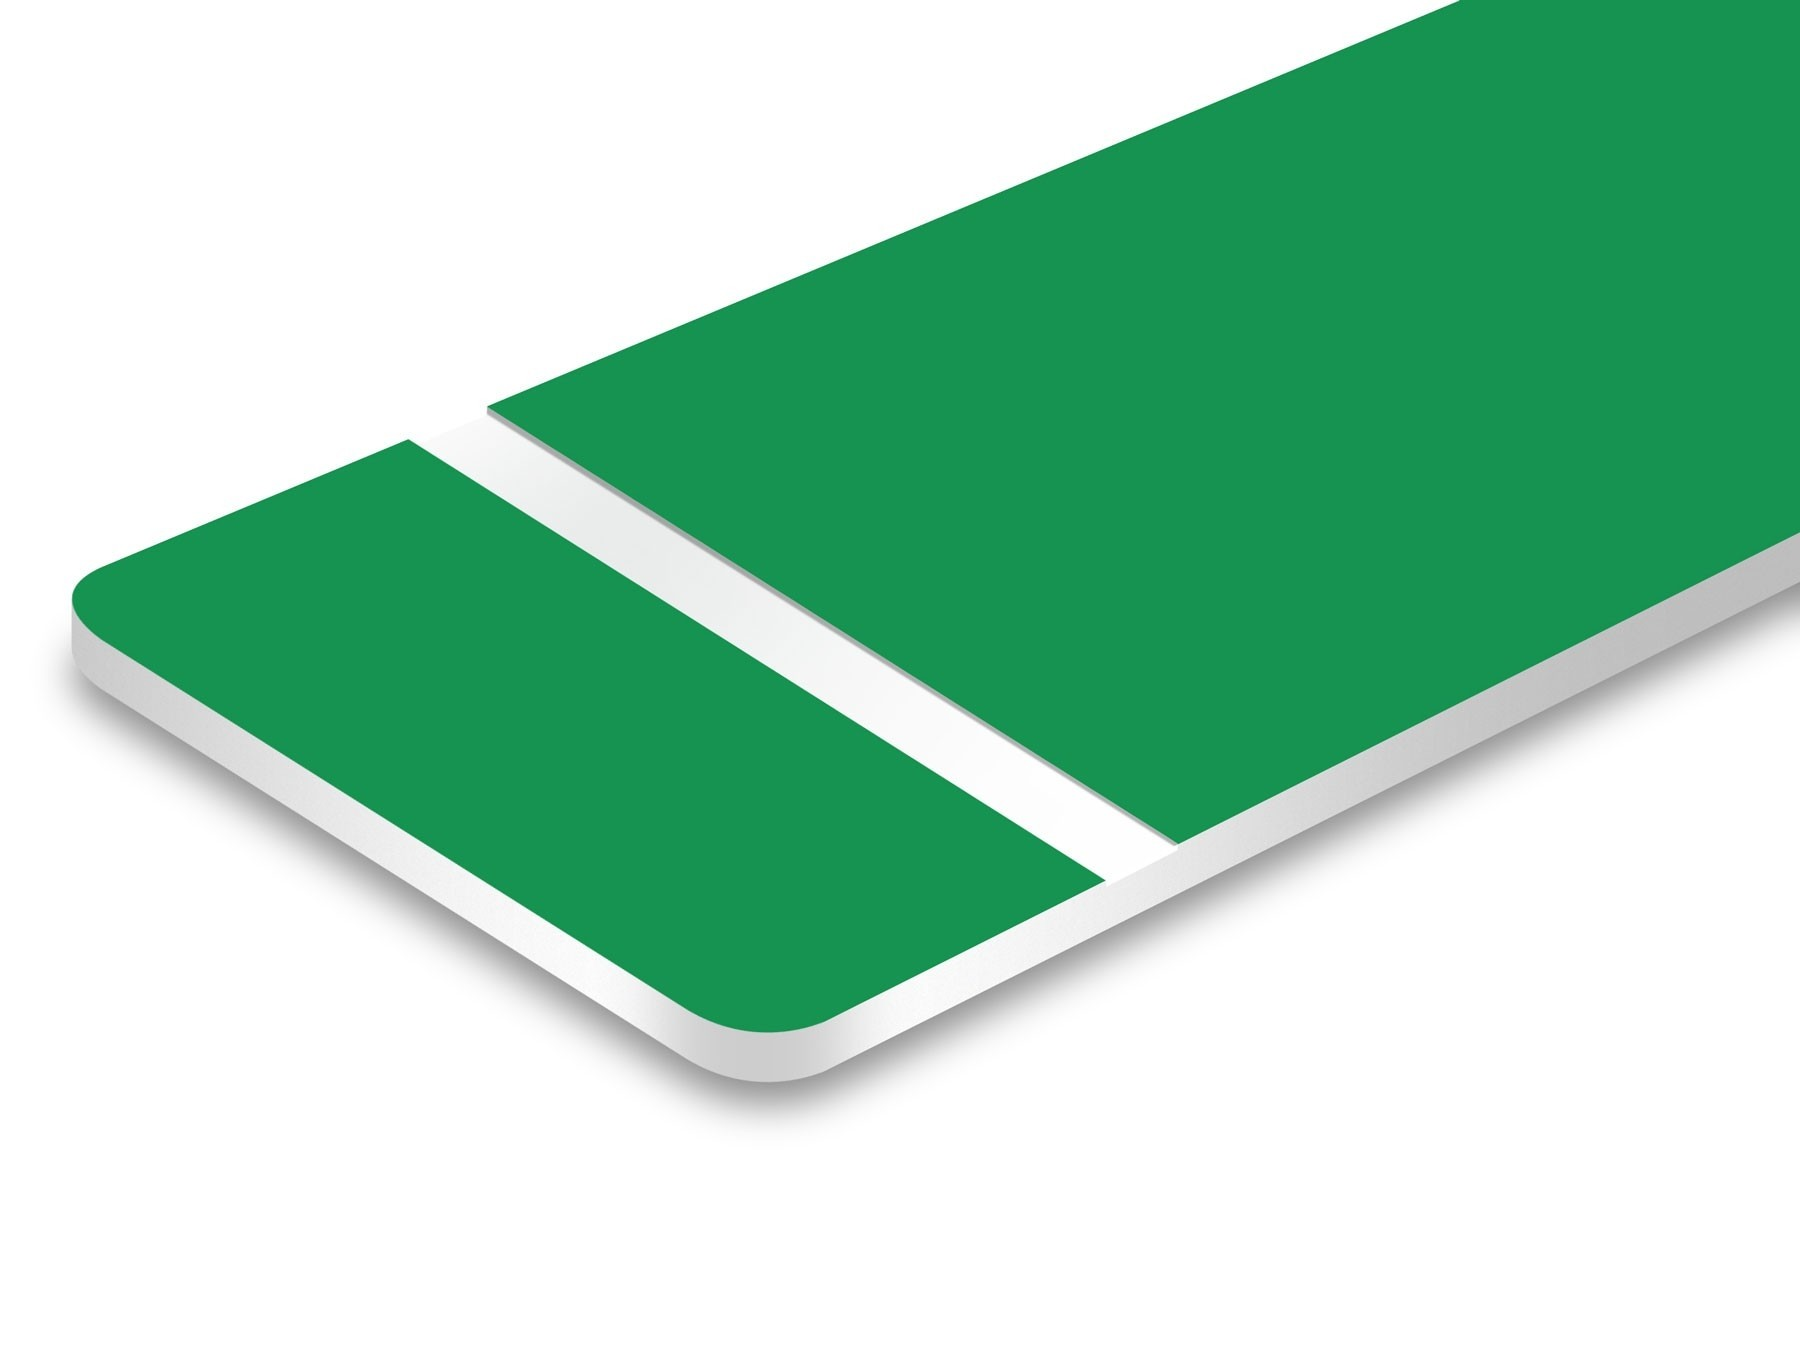 TroLase, Bright Green/White, 2ply, 0.8 mm